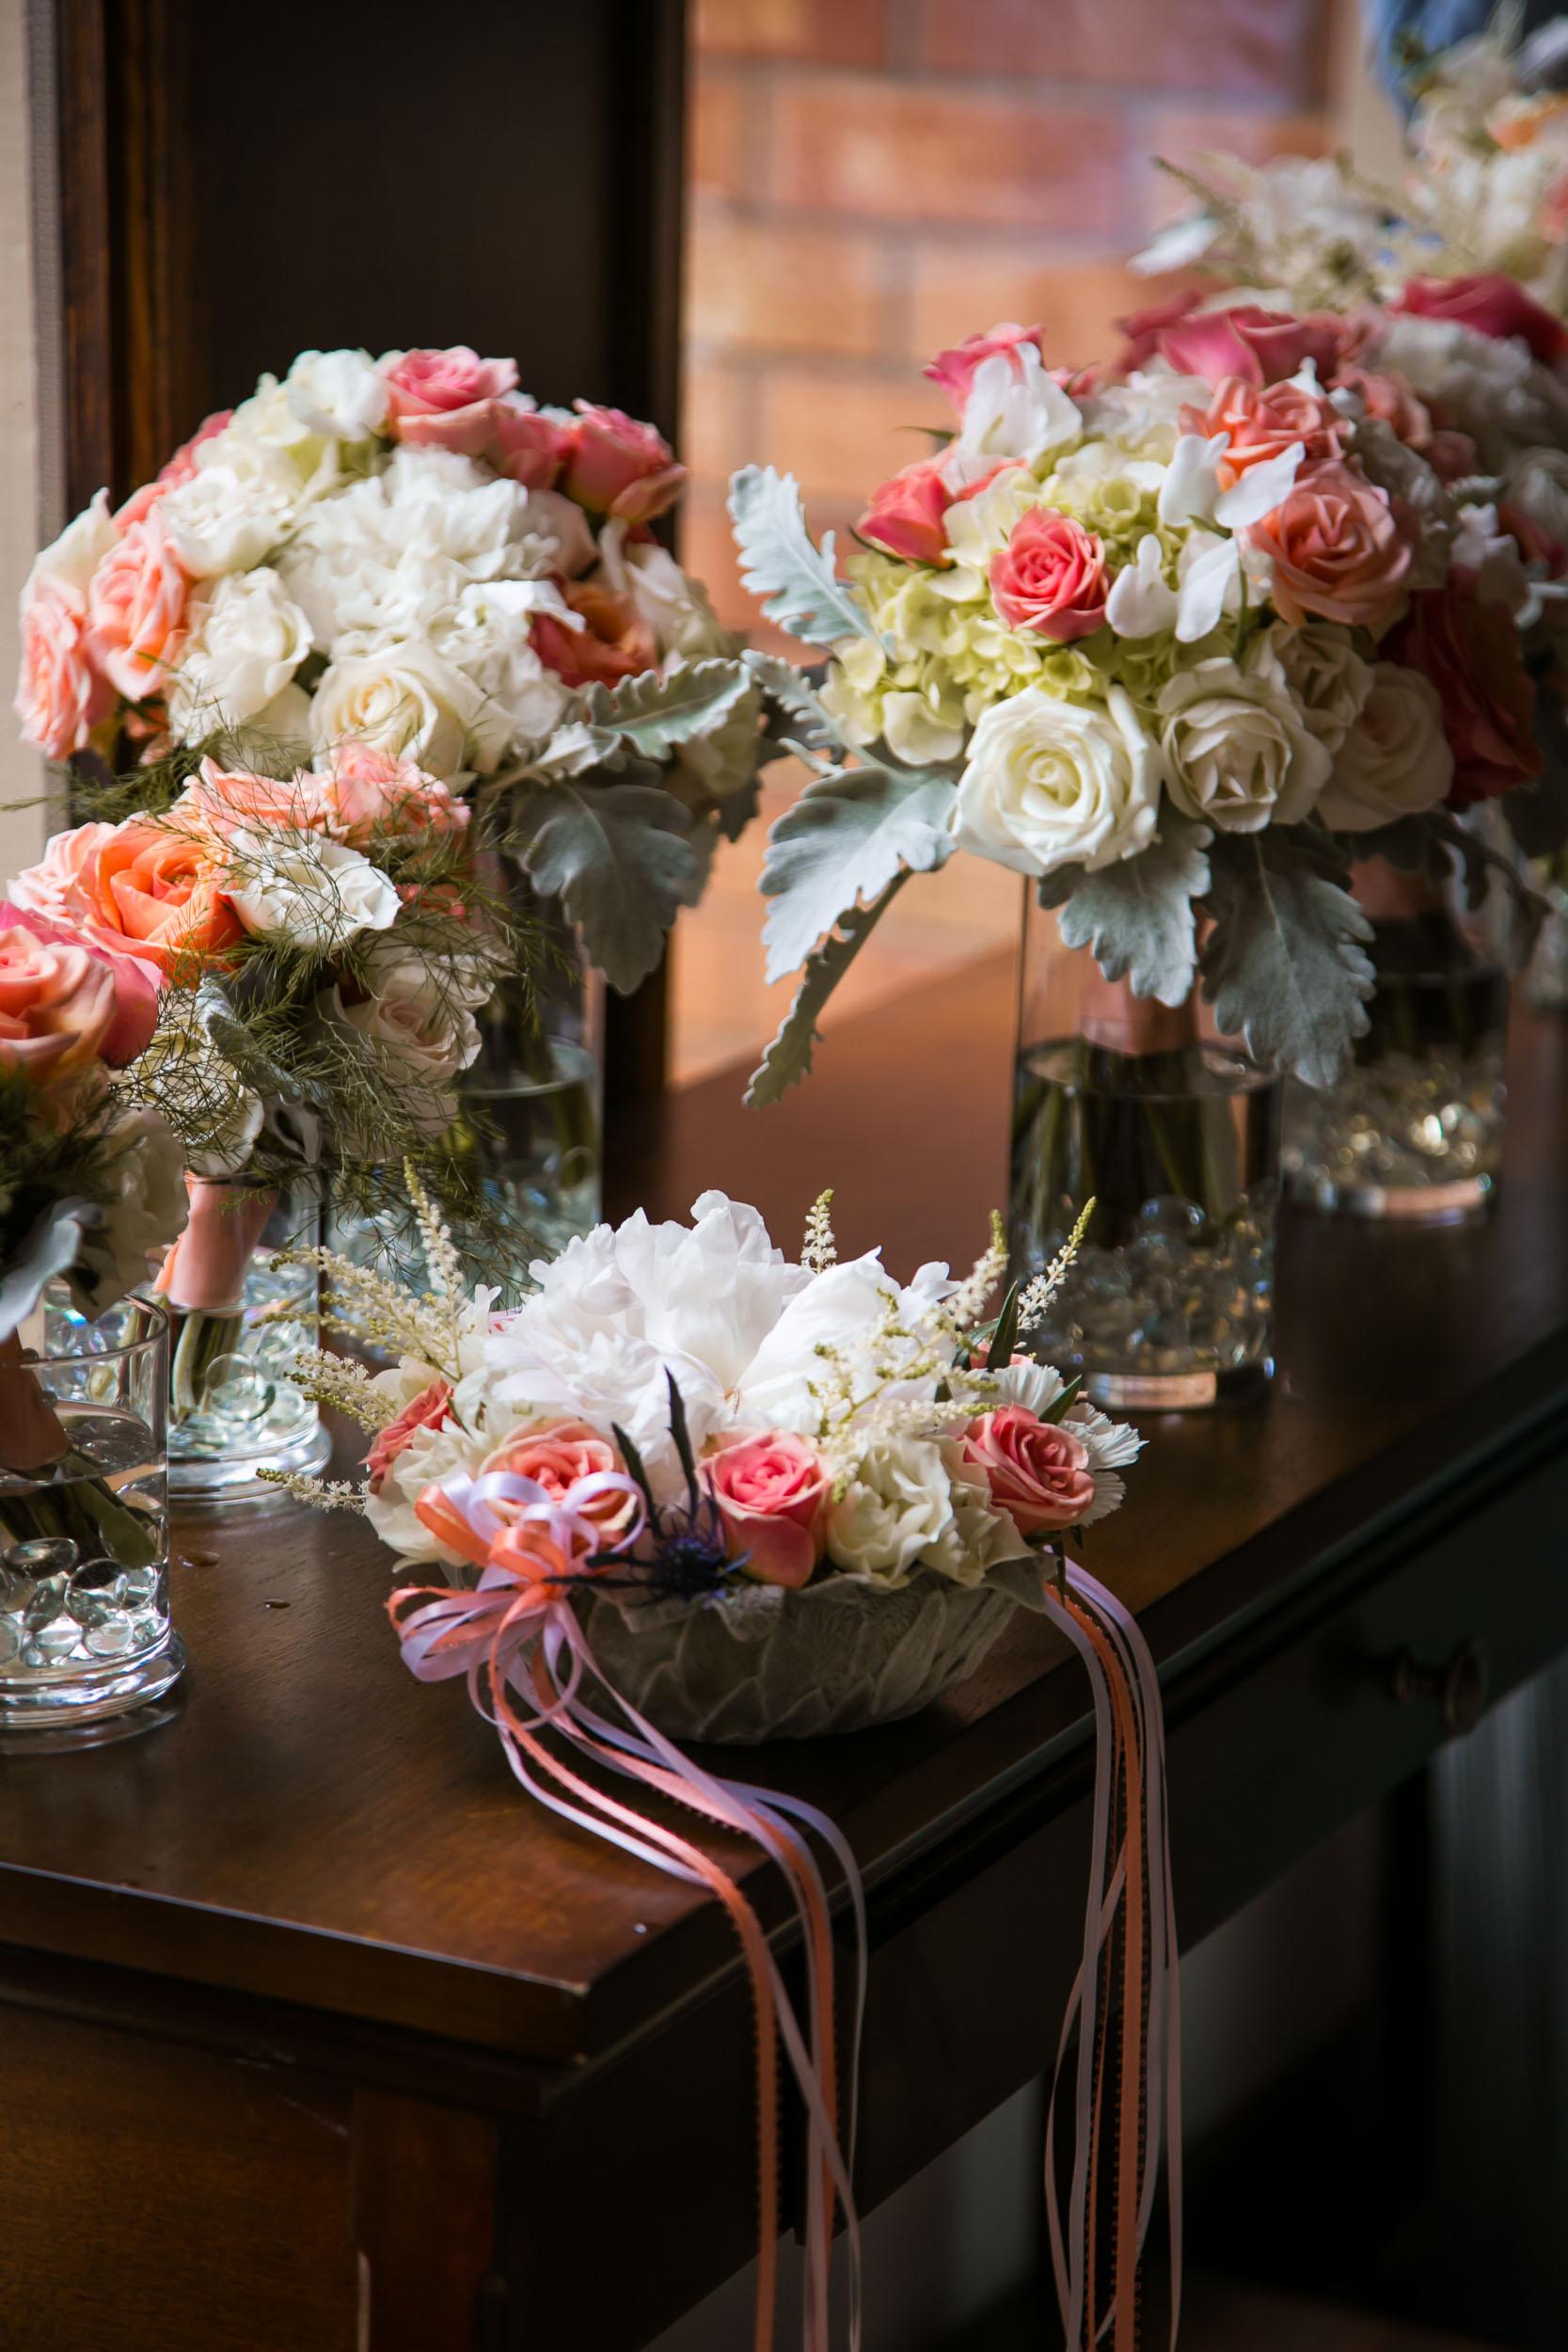 Raleigh Wedding Photographer | G. Lin Photography | Flower arrangement on table at church